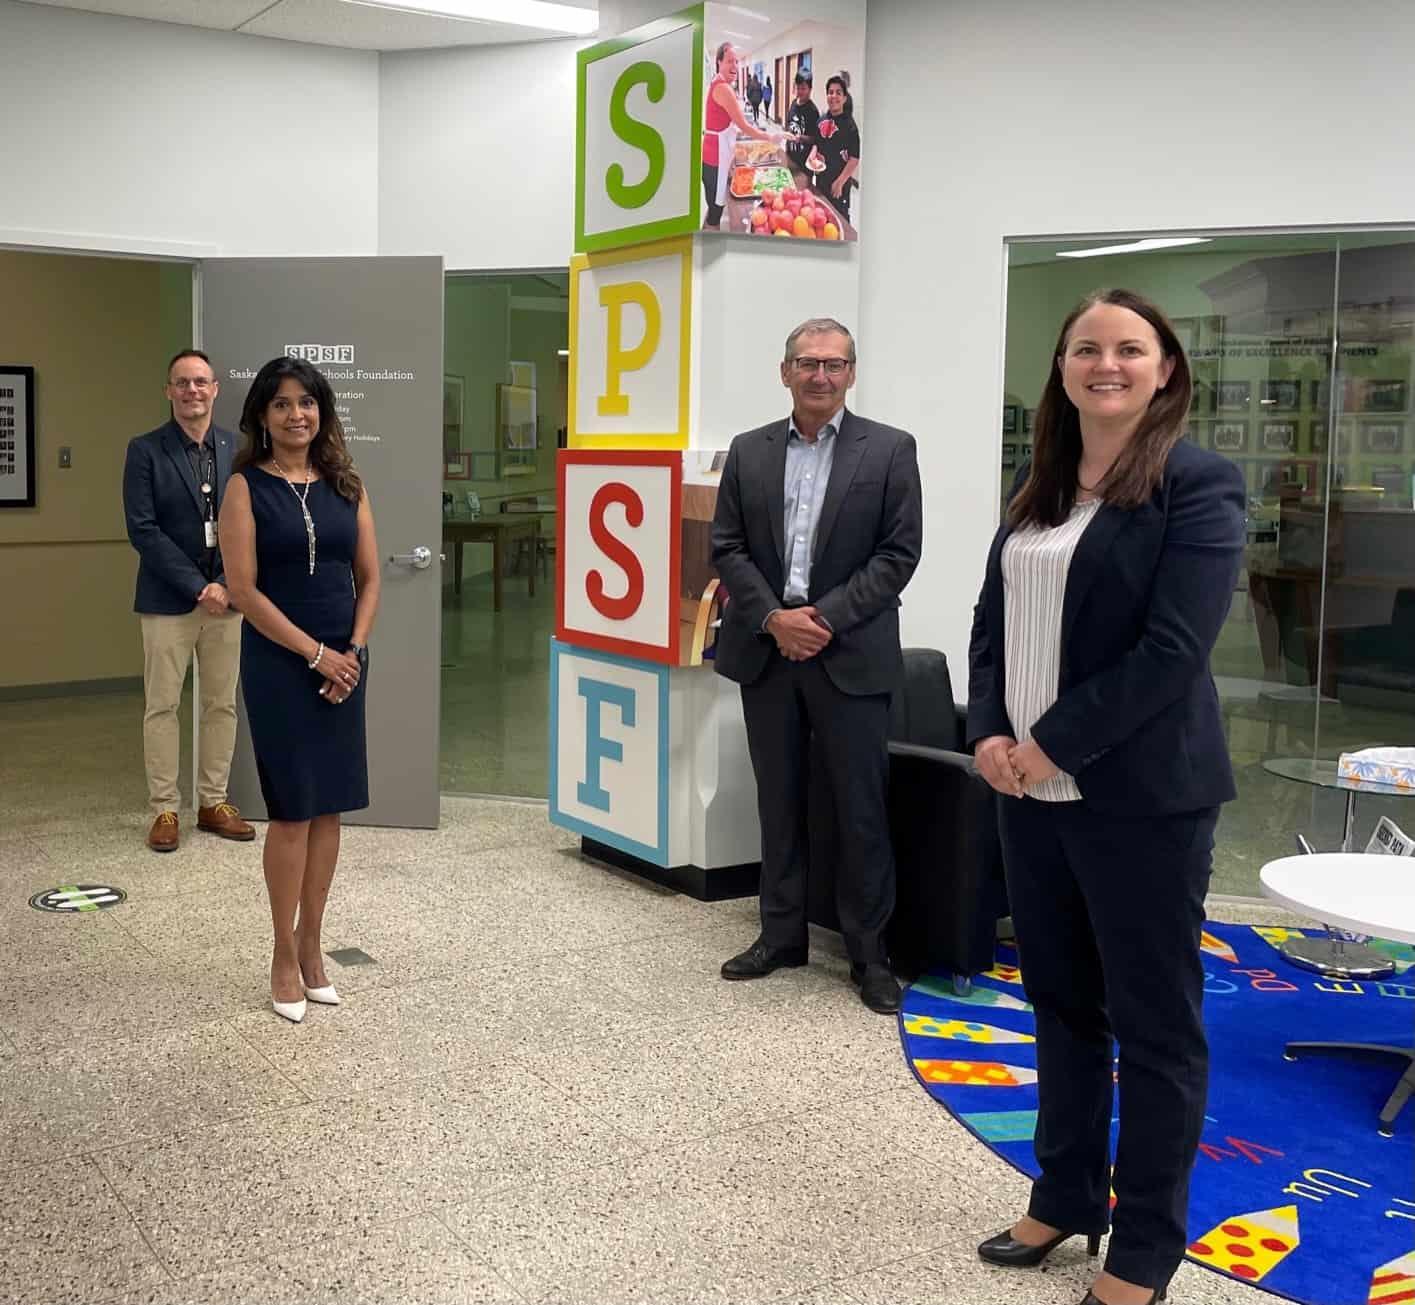 MLT Aikins Donation to Saskatoon Public Schools Foundation